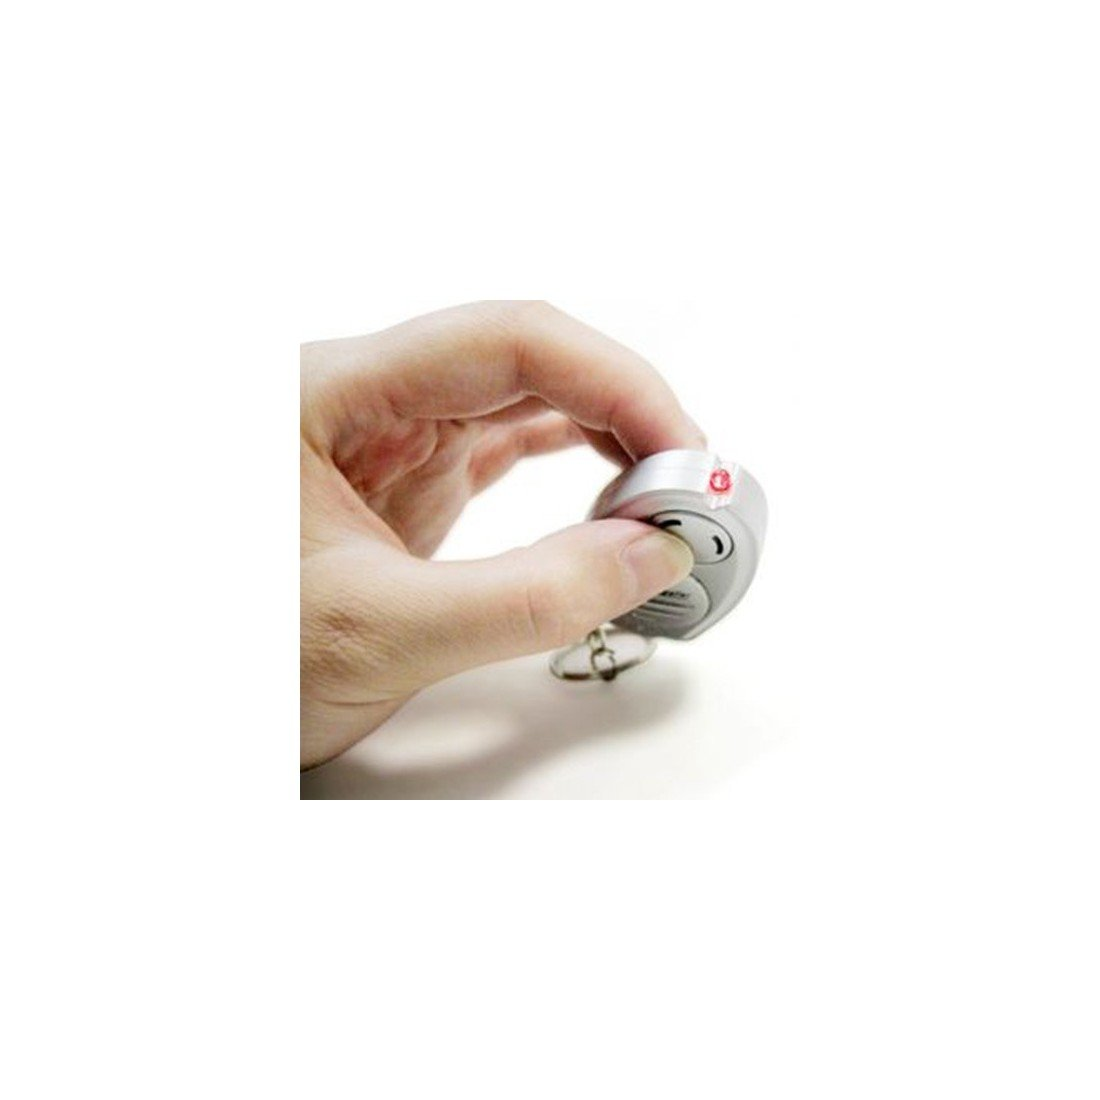 Genérico - Llavero antimosquitos mosquito keychain: Amazon ...